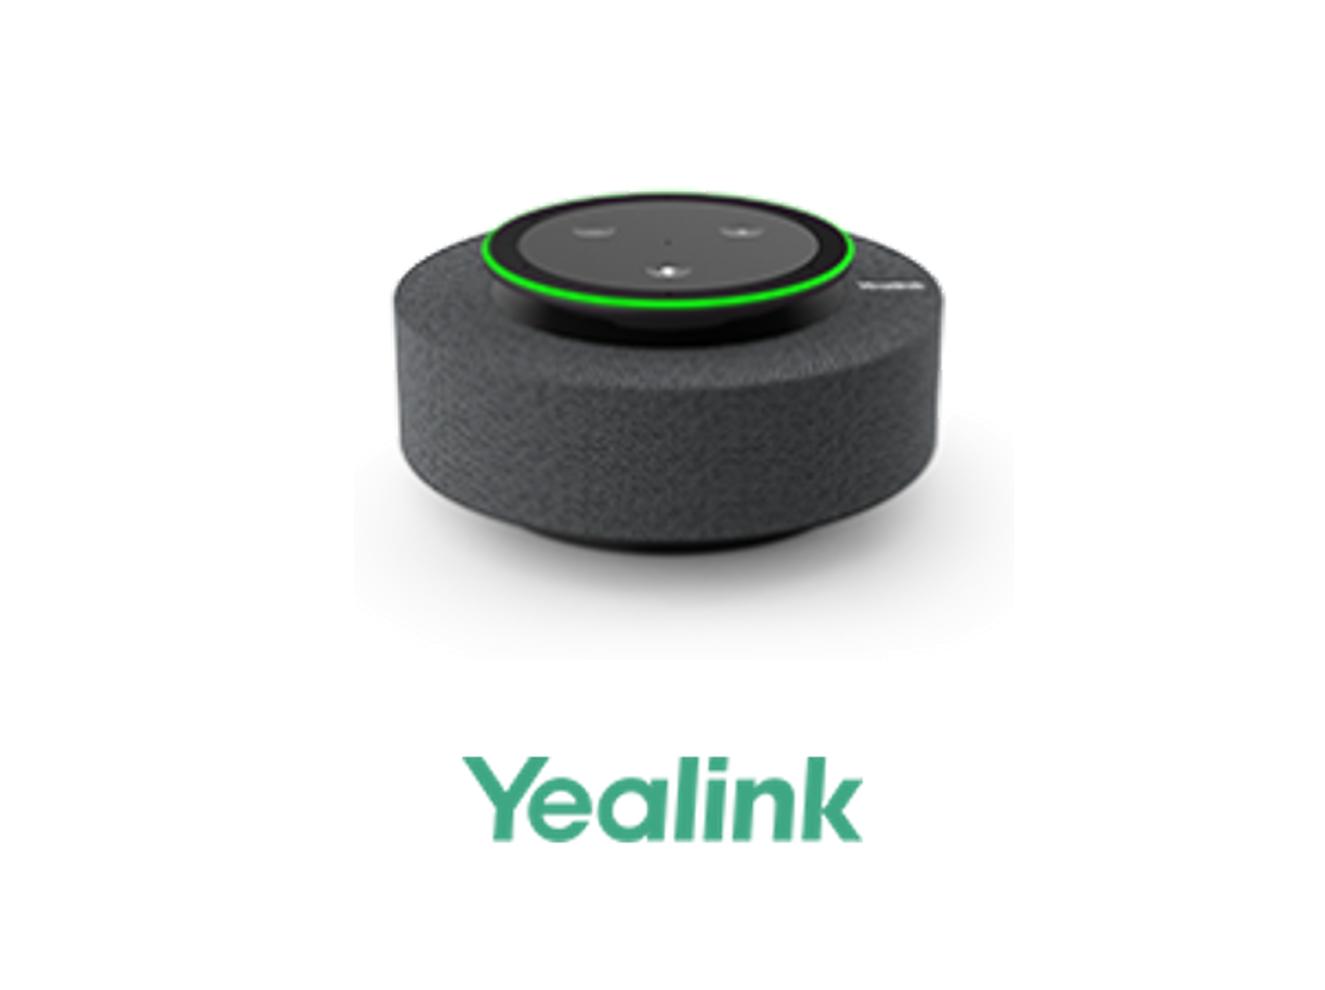 Yealink Microsoft Teams Video Conferencing Kit